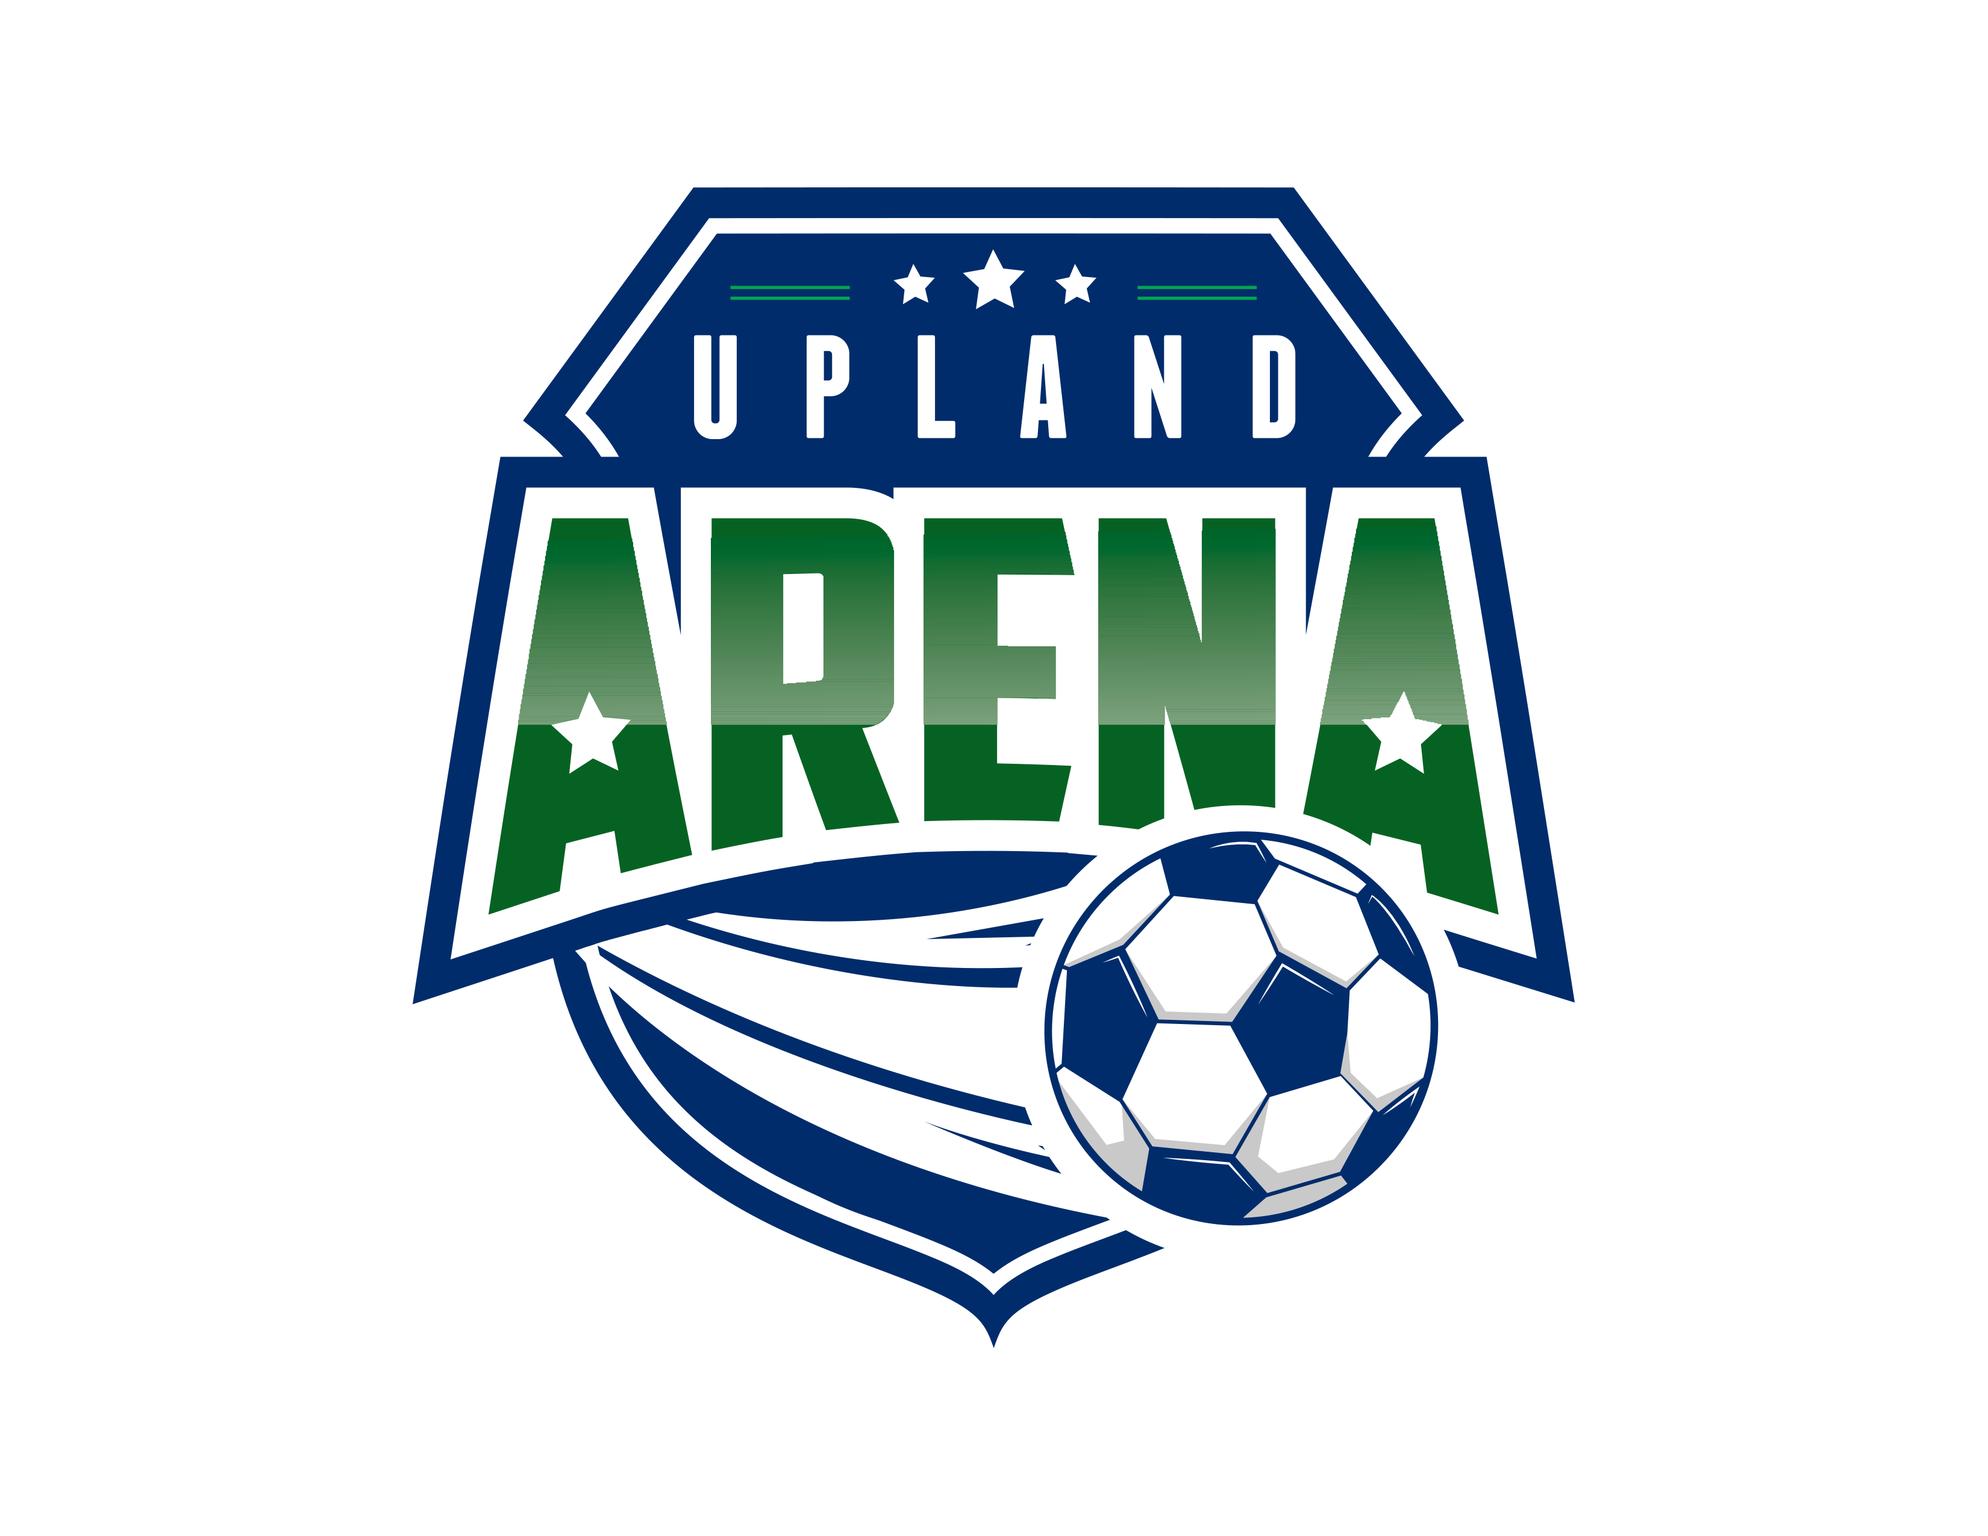 Upland Arena